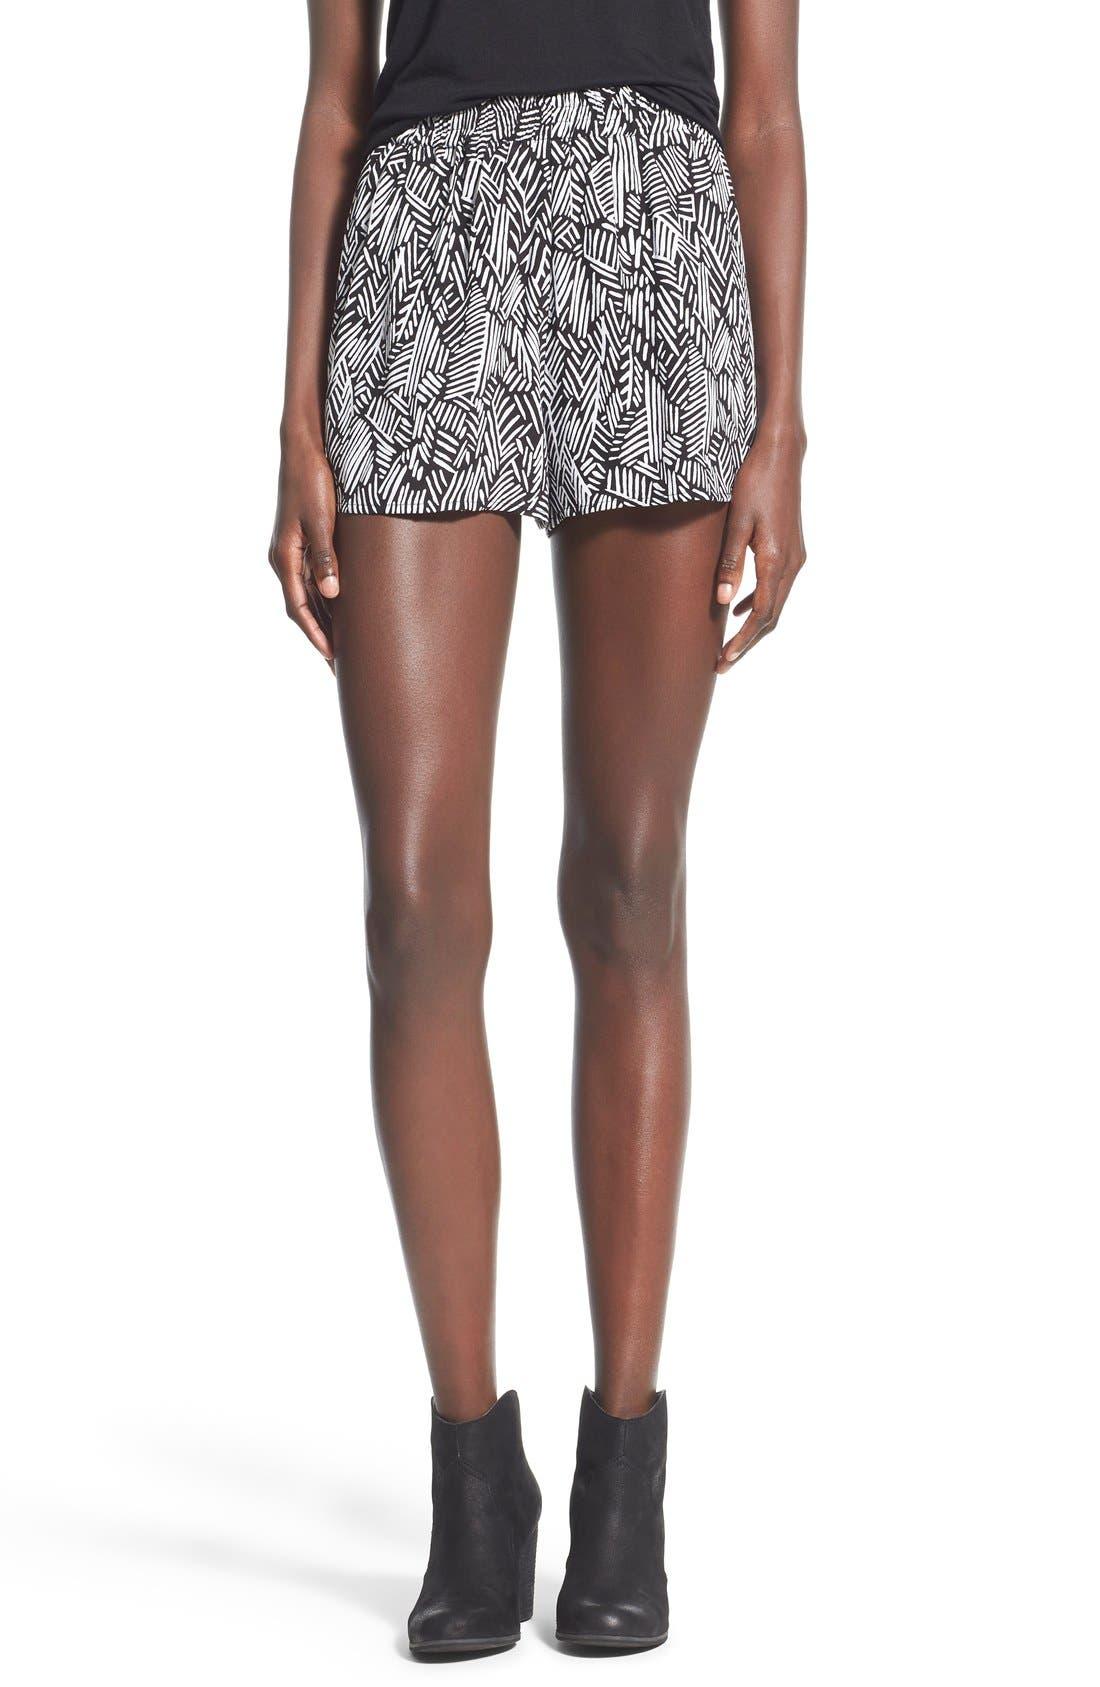 Alternate Image 1 Selected - BP. Woven Print Shorts